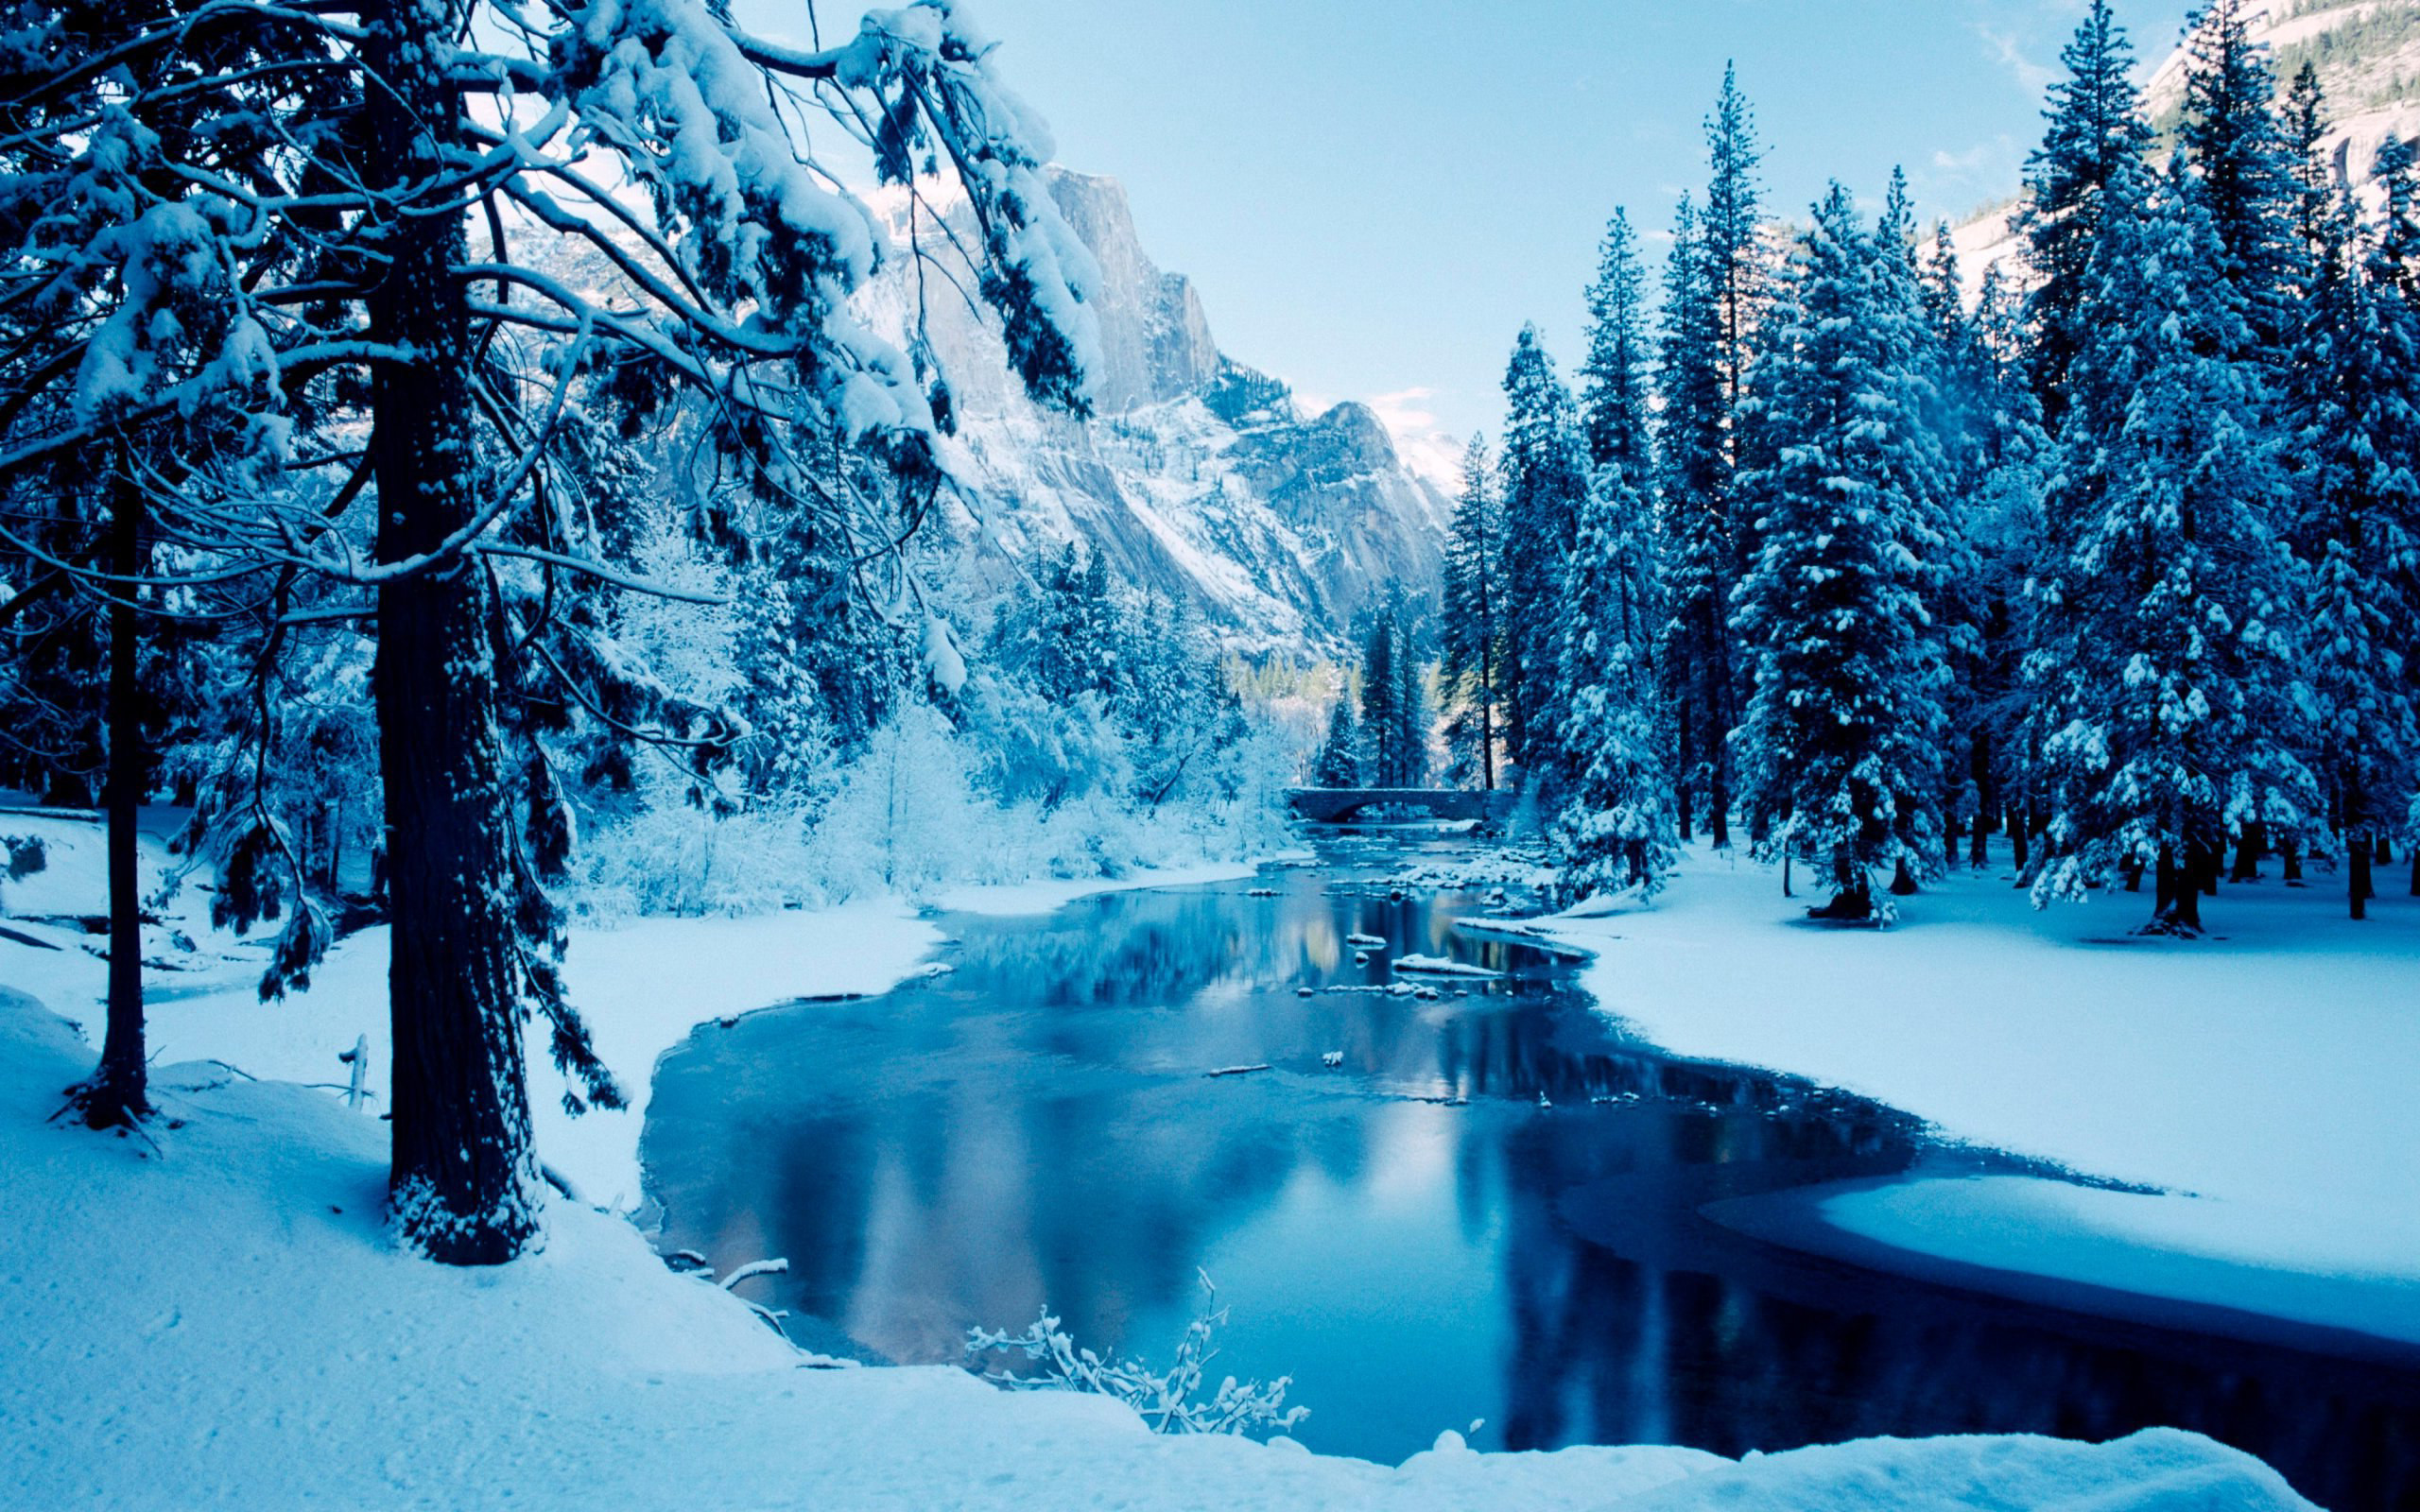 Winter Ice Lake Scenes Desktop Wallpaper   Wallpapers   Pinterest   Winter  scenes, Scene and Wallpaper